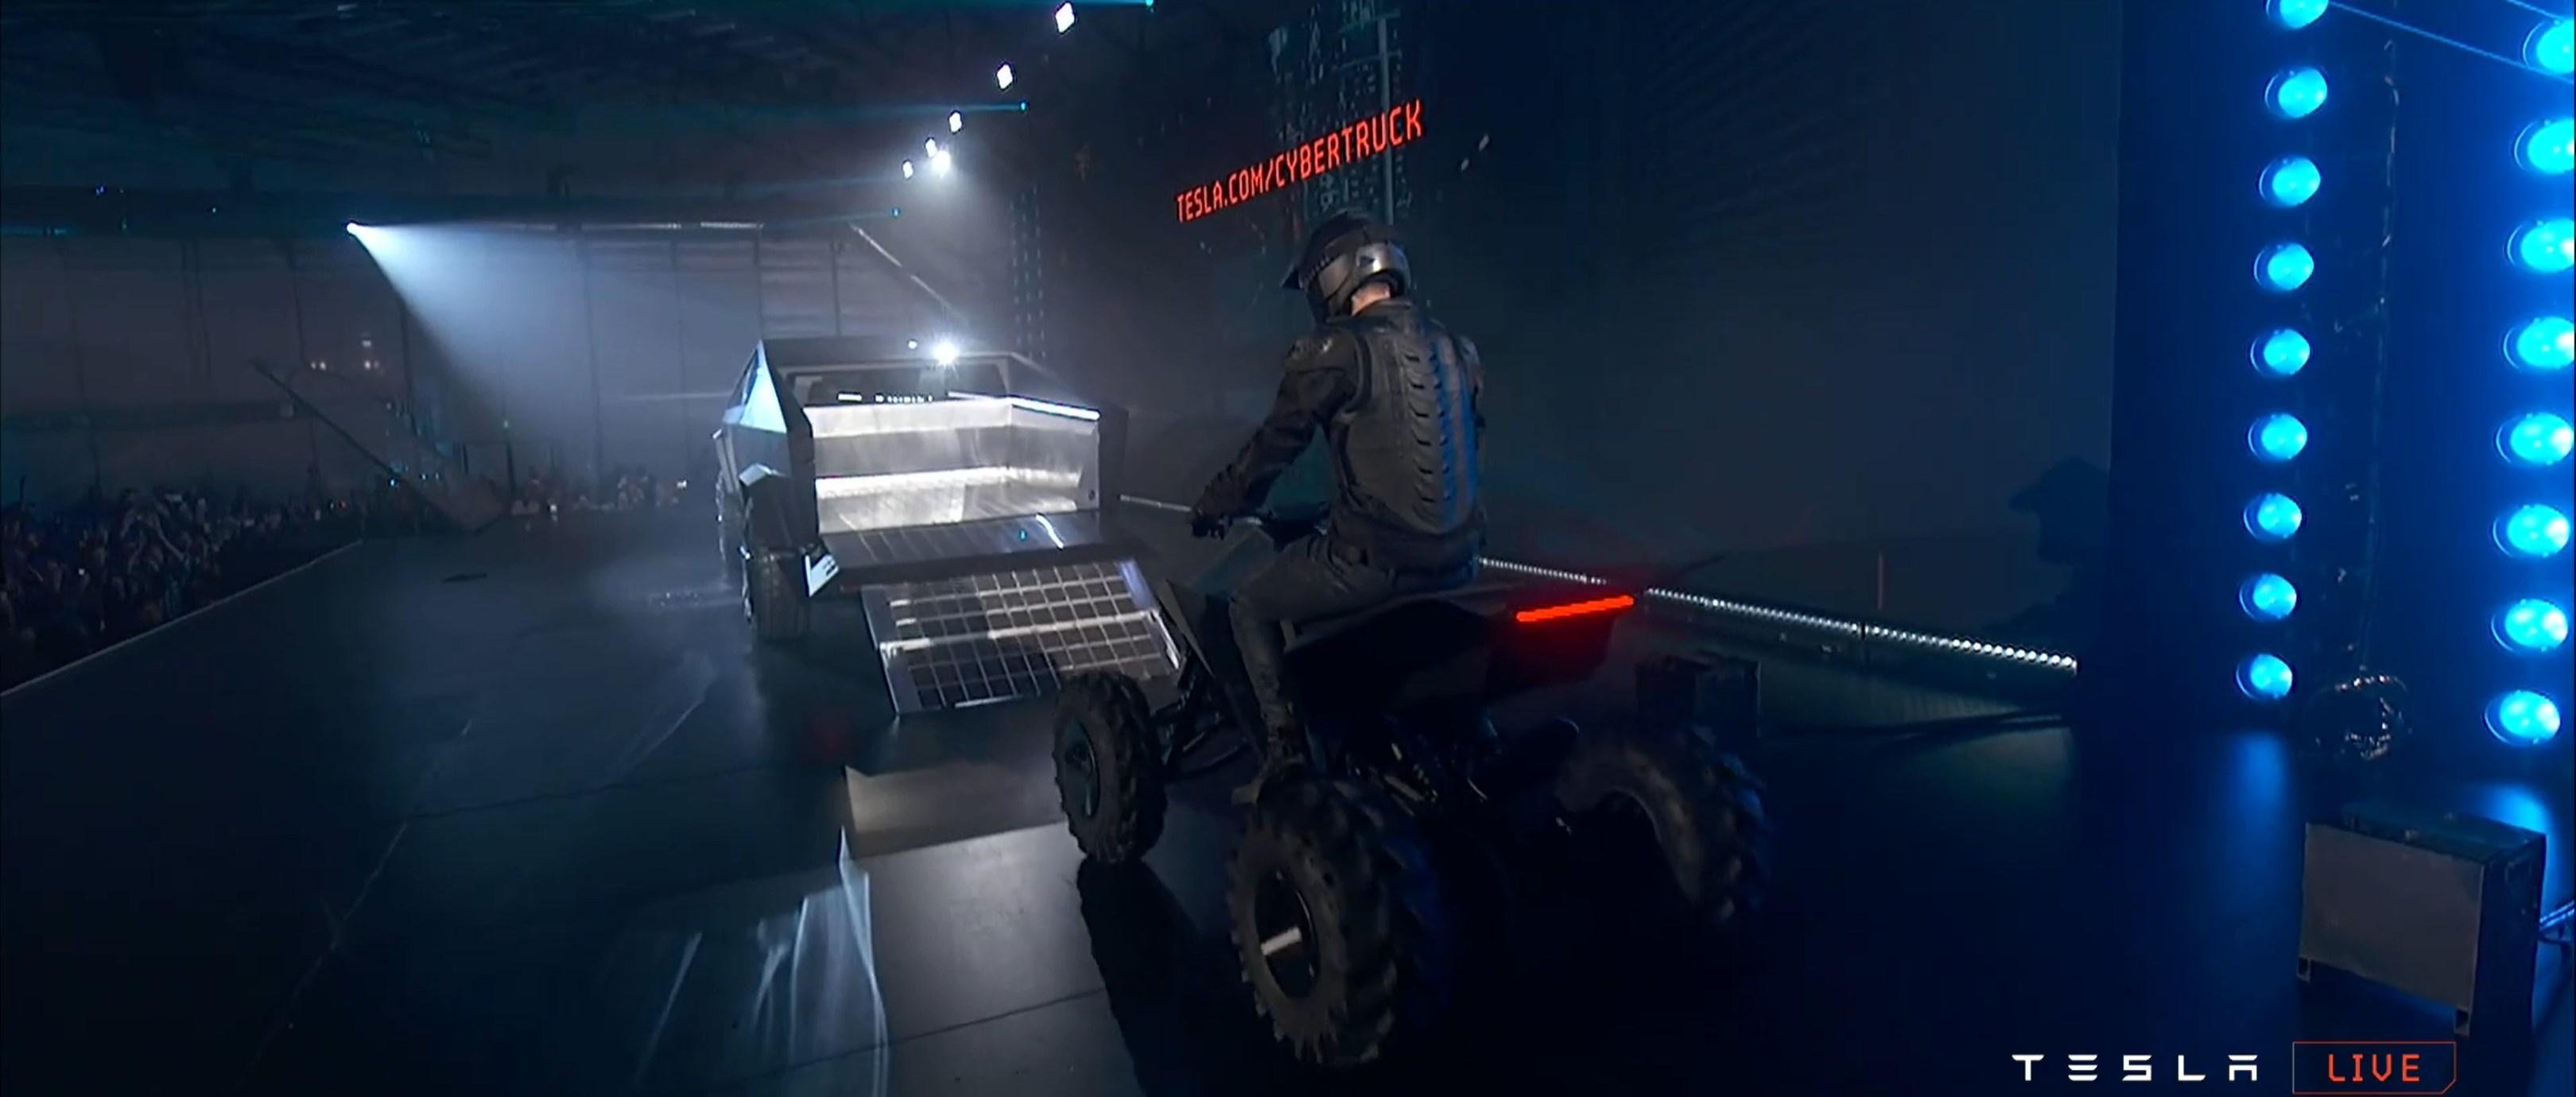 Cybertruck reveal webcast (Tesla) ATV bed 2